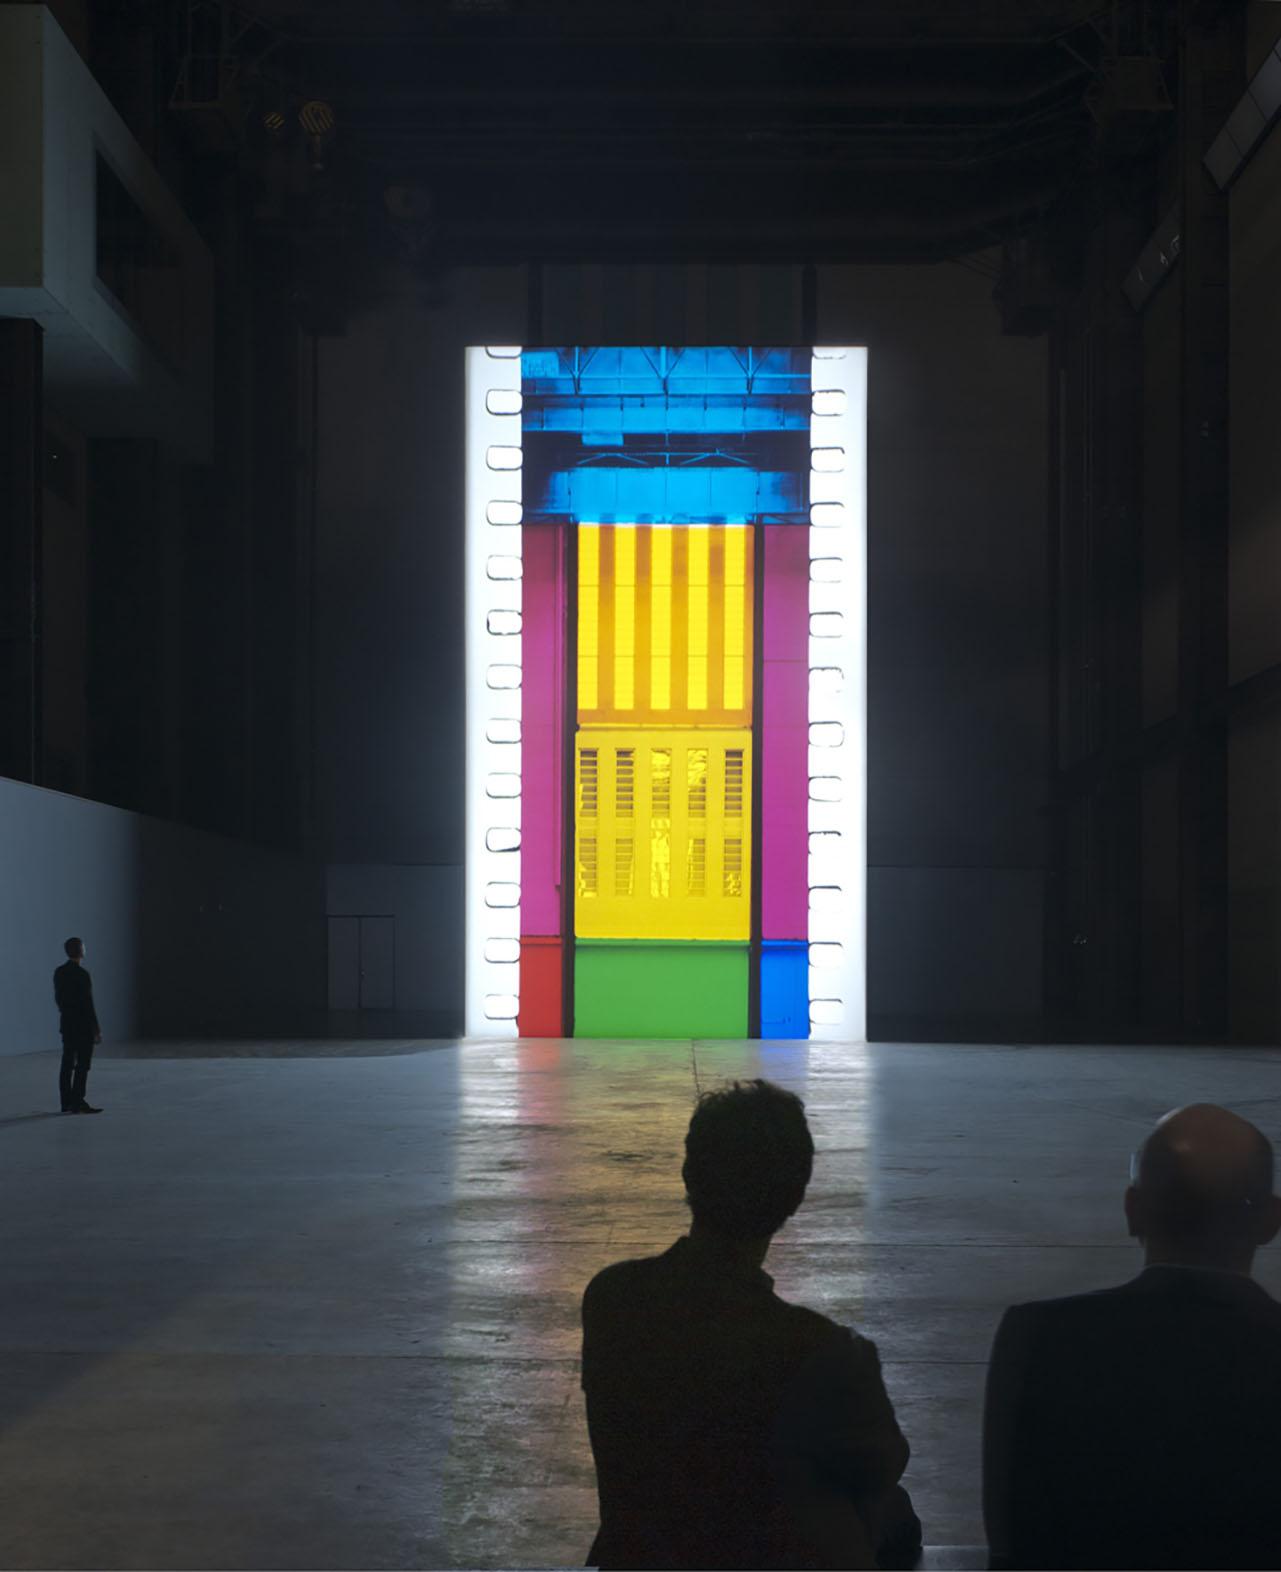 tacita-dean-film-2011-unilever-series-installation-view-tate-modern_1281w